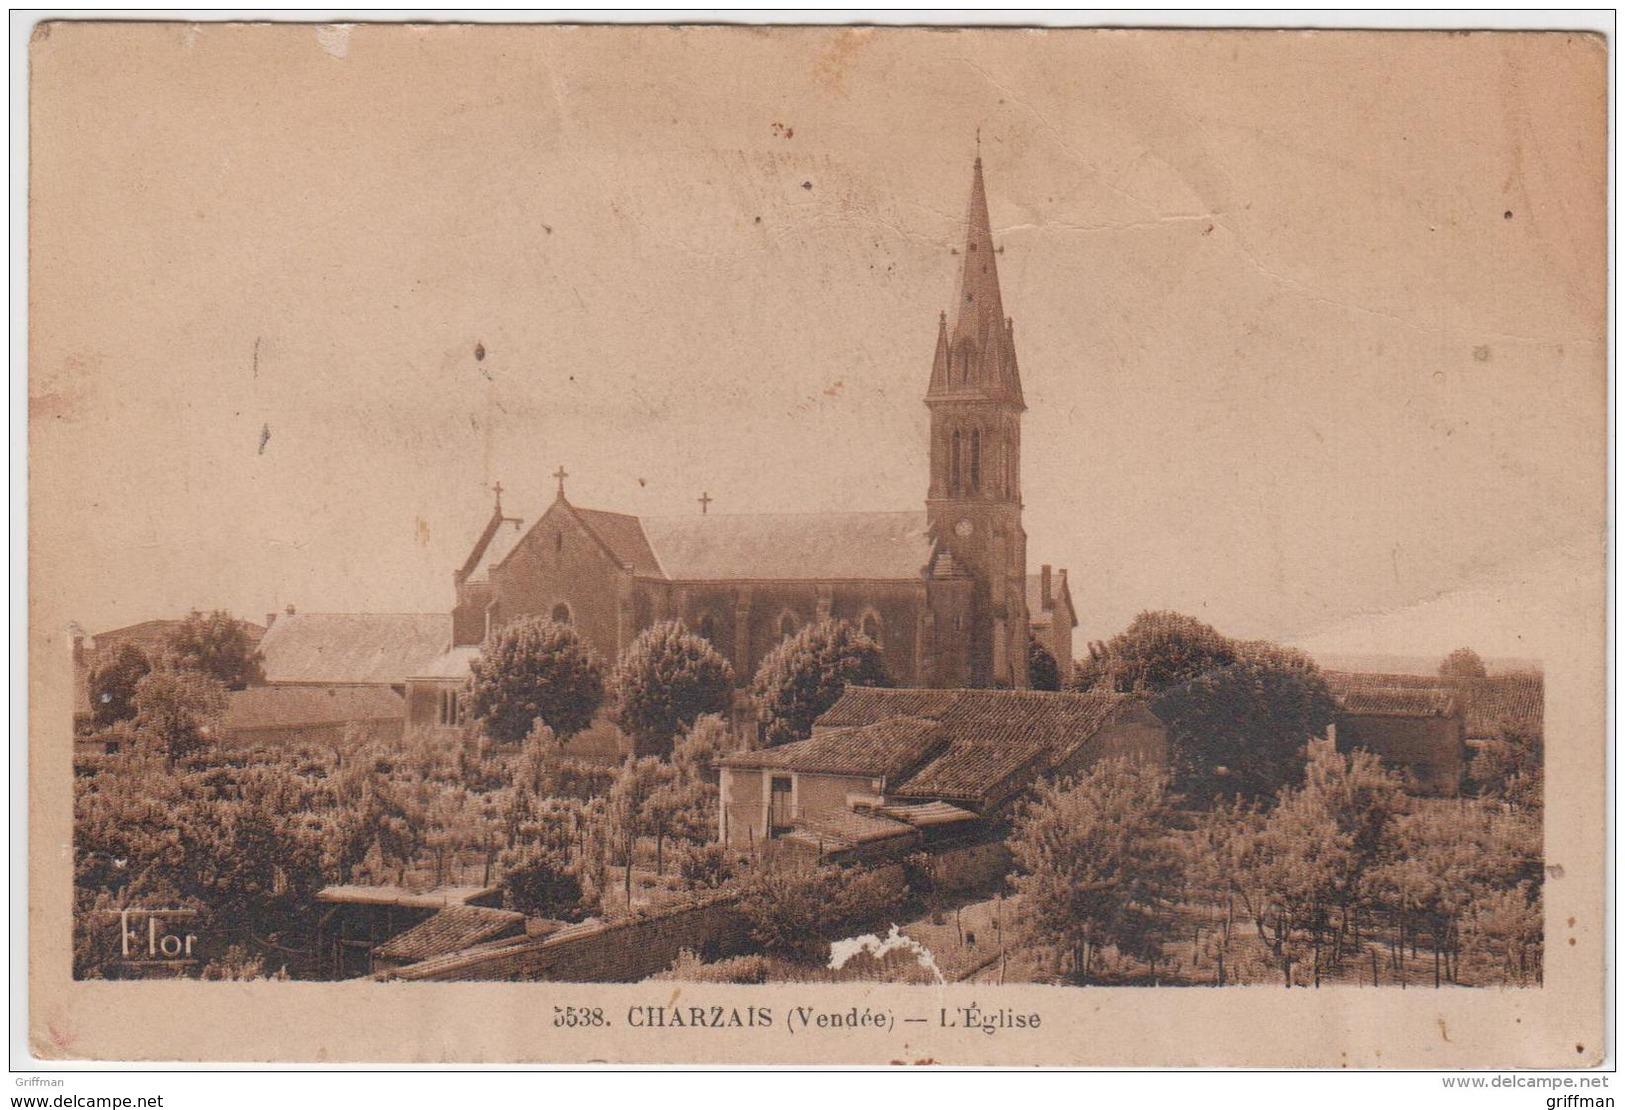 CHARZAIS L'EGLISE - France